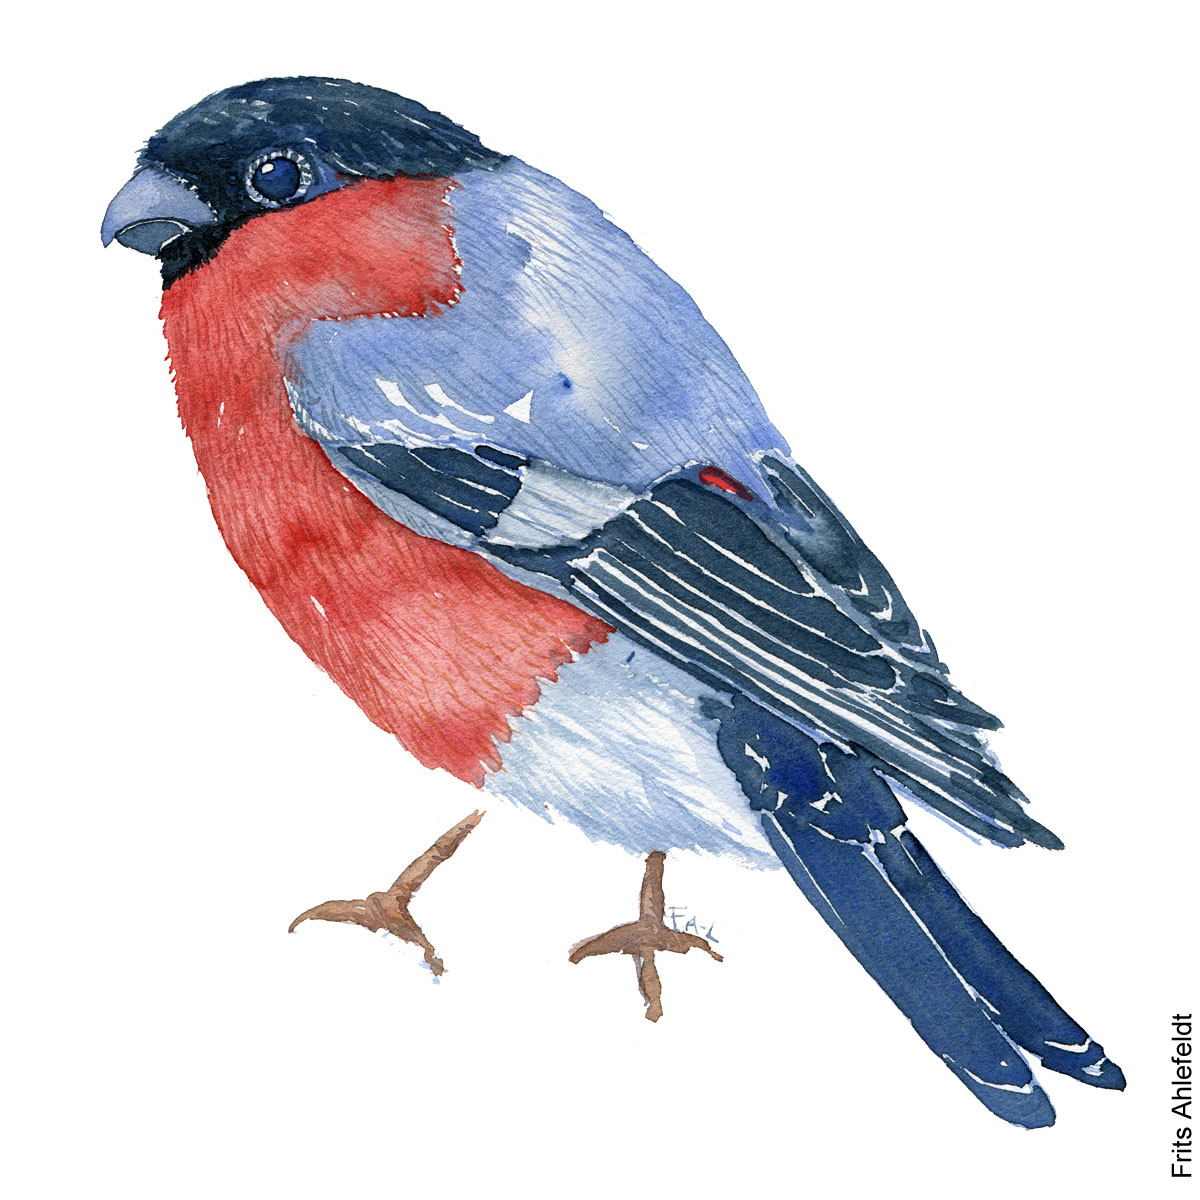 European bullfinch bird watercolor painting. Artwork by Frits Ahlefeldt. Fugle akvarel